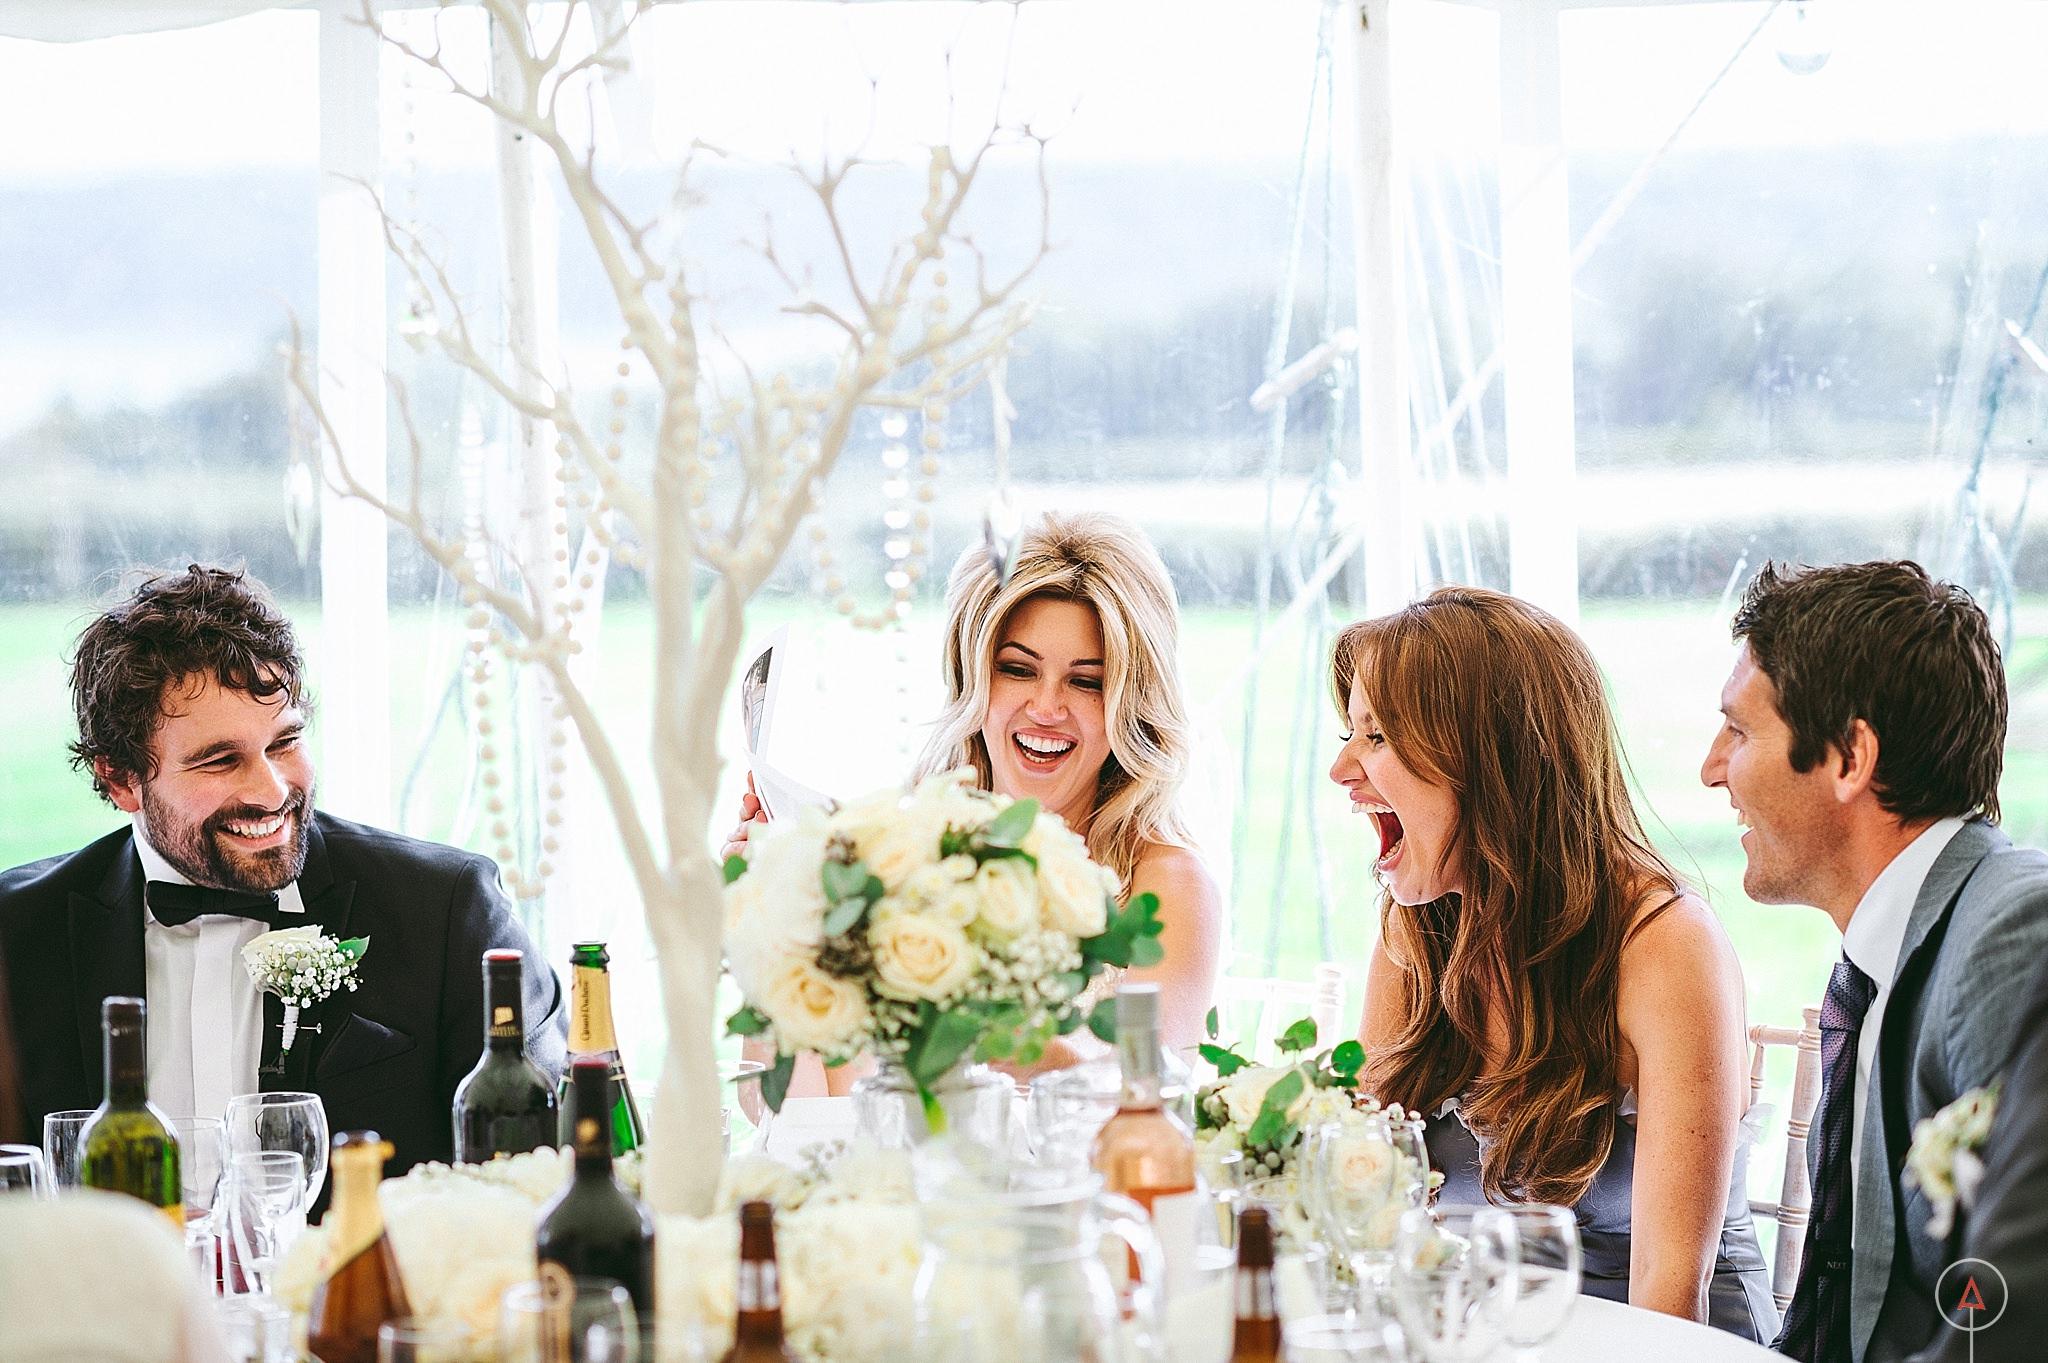 cardiff-wedding-photographer-aga-tomaszek_0399